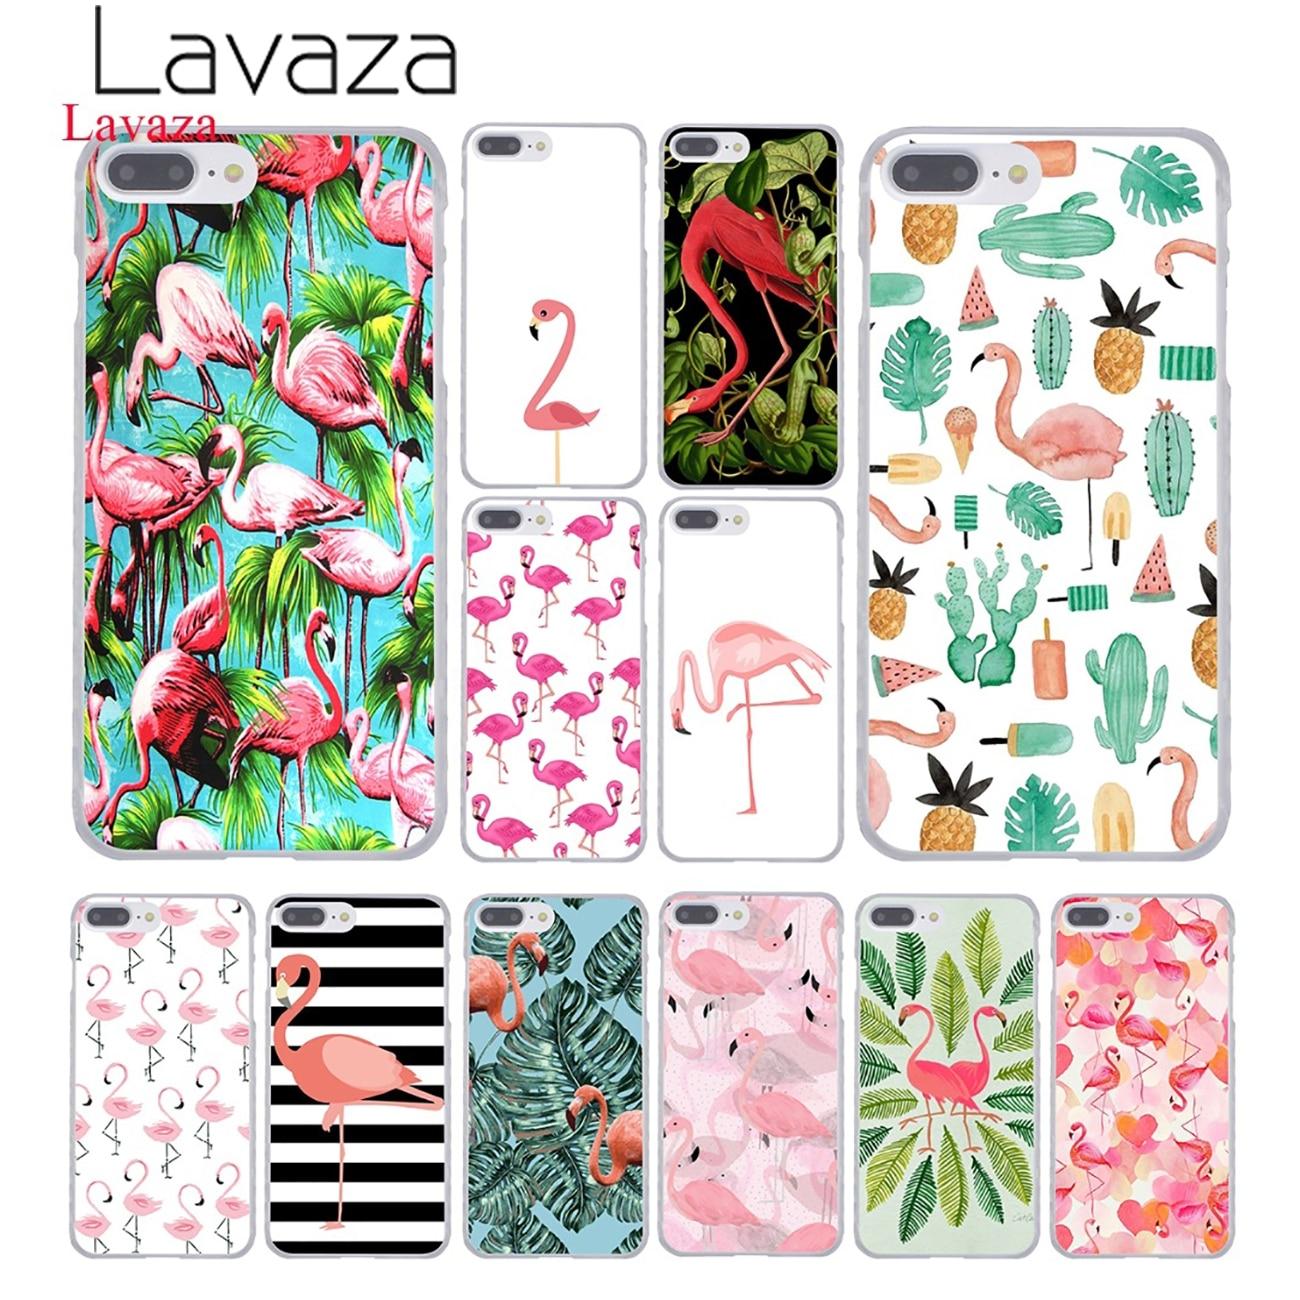 Lavaza Lips Flamingo Flamingos Themed Pool Party Hard Phone <font><b>Case</b></font> for Apple <font><b>iPhone</b></font> 8 7 6 6S Plus X <font><b>10</b></font> 5 5S SE 5C 4 4S